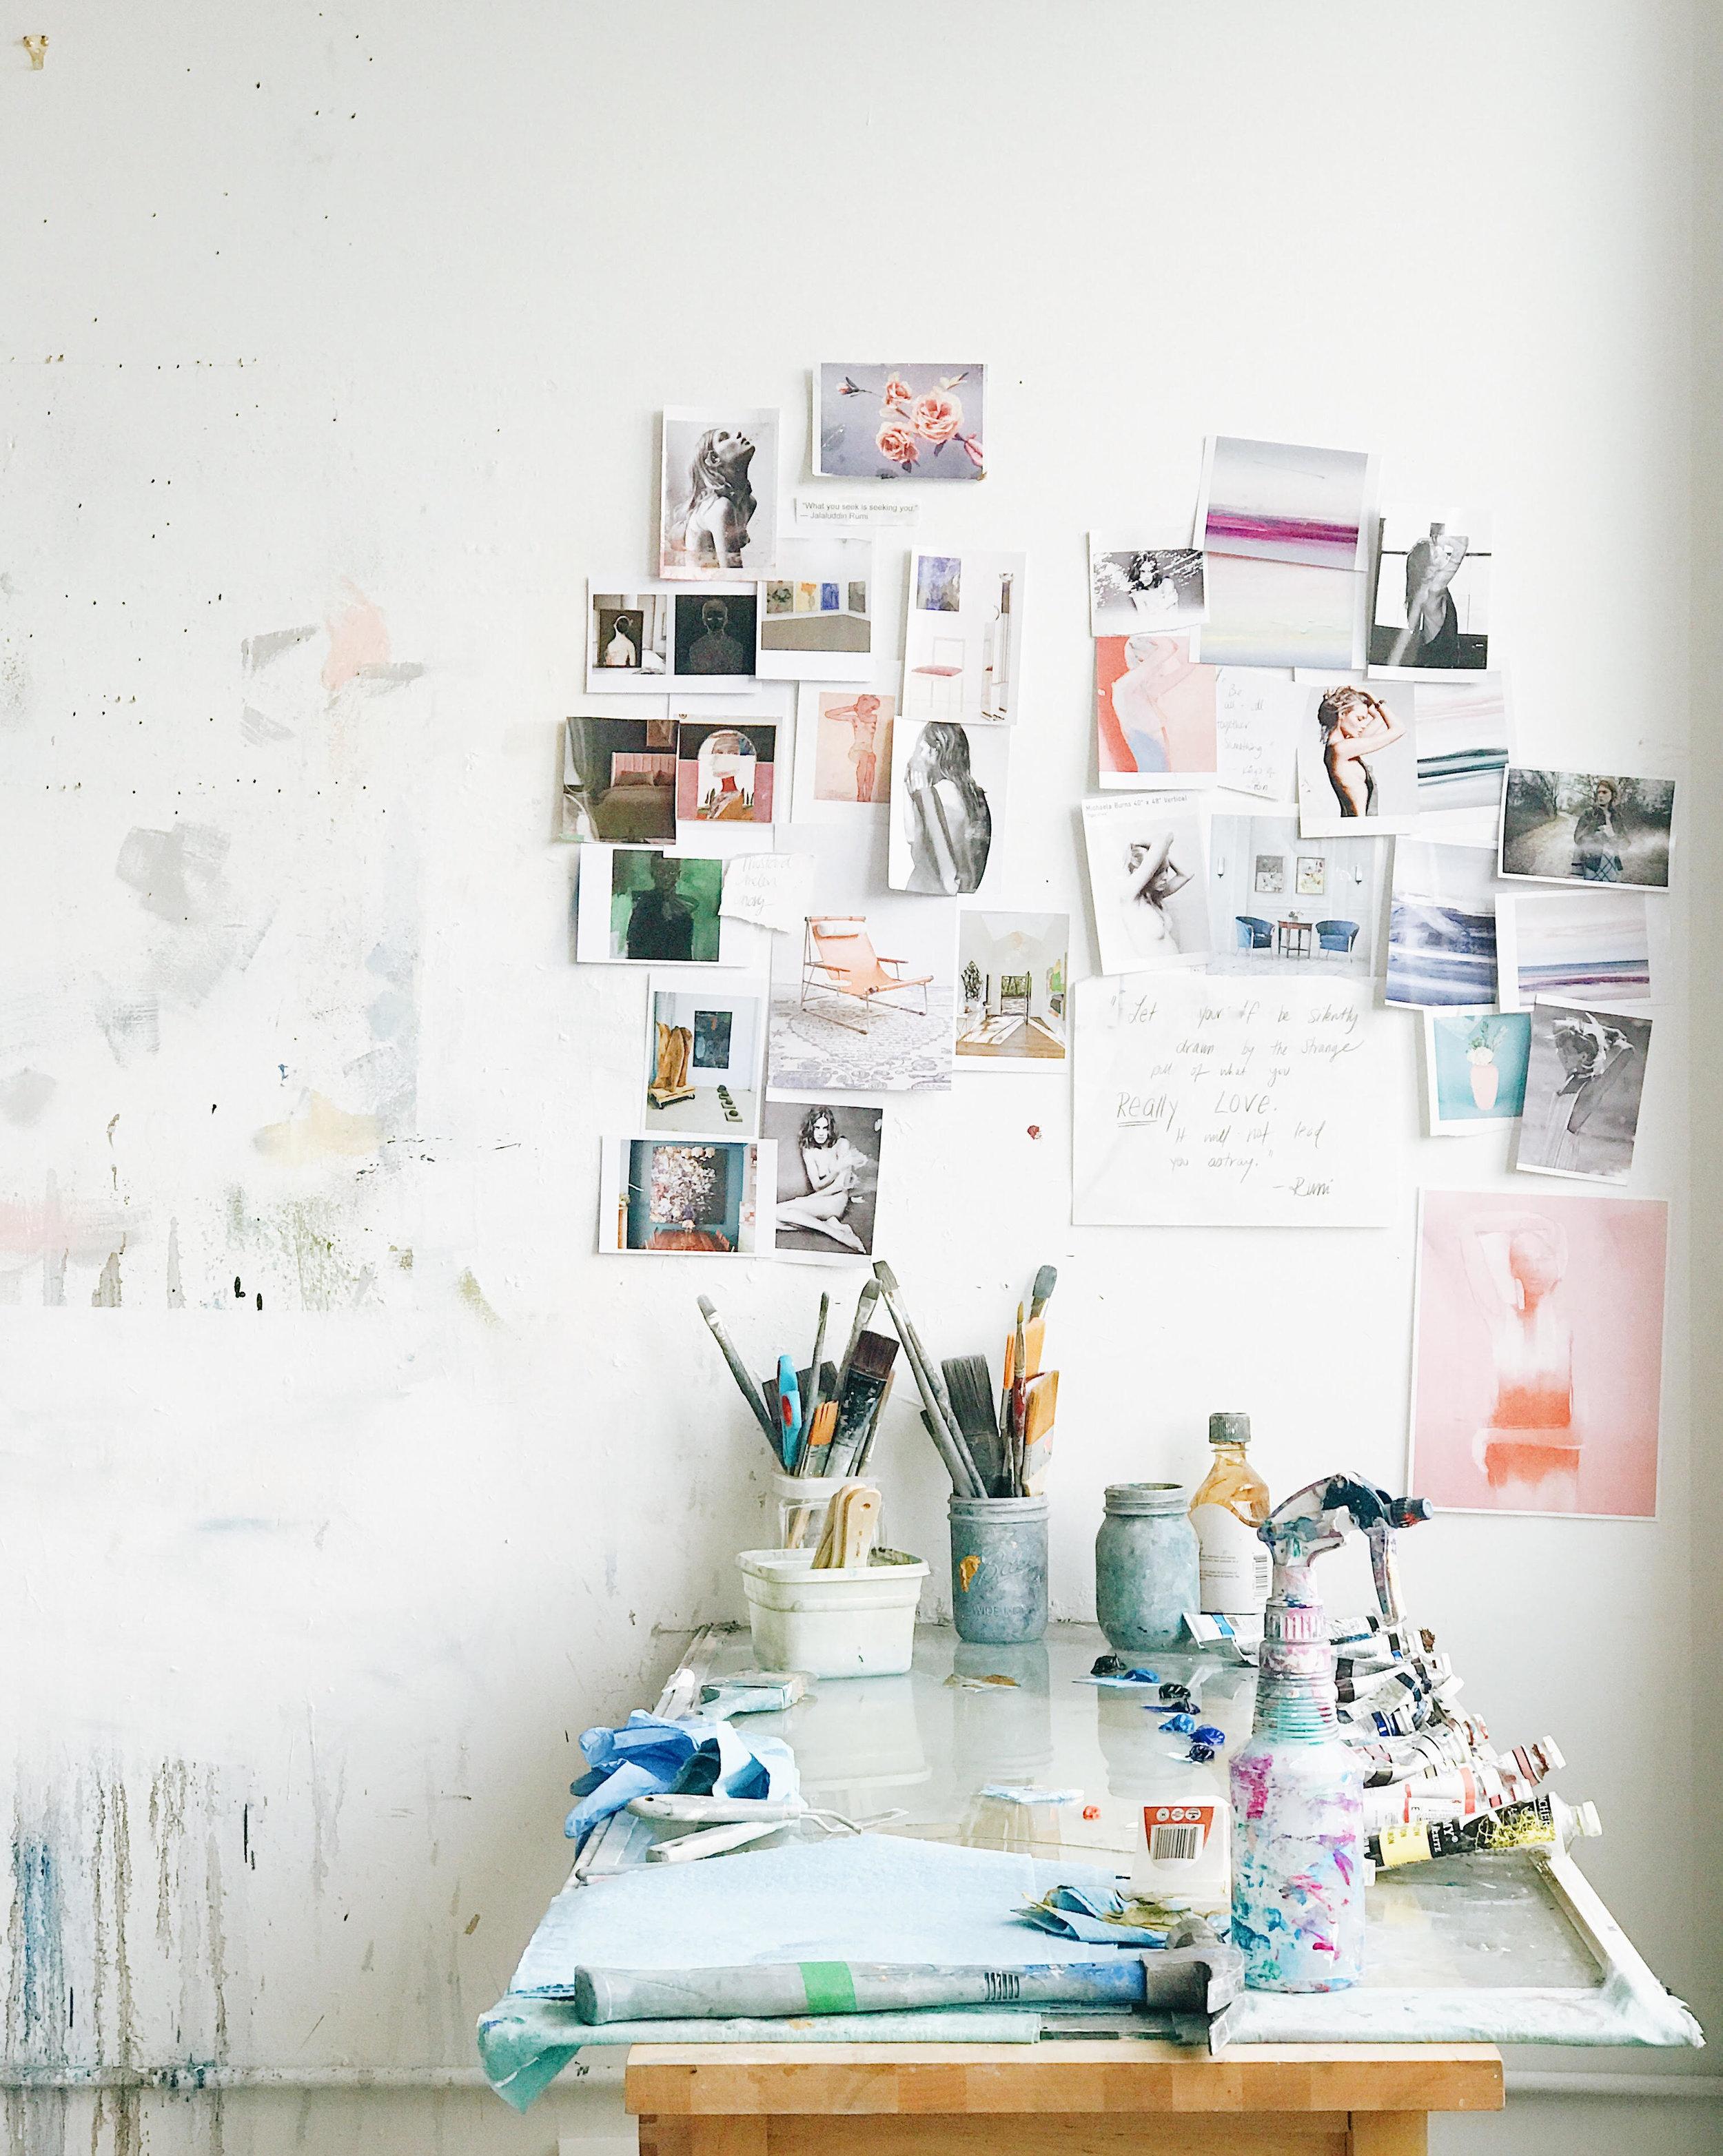 Zoe Pawlak, Nyla Free Designs Travels Montreal, Weekend Guide, Travel Tips, Canada, Calgary Interior Designer